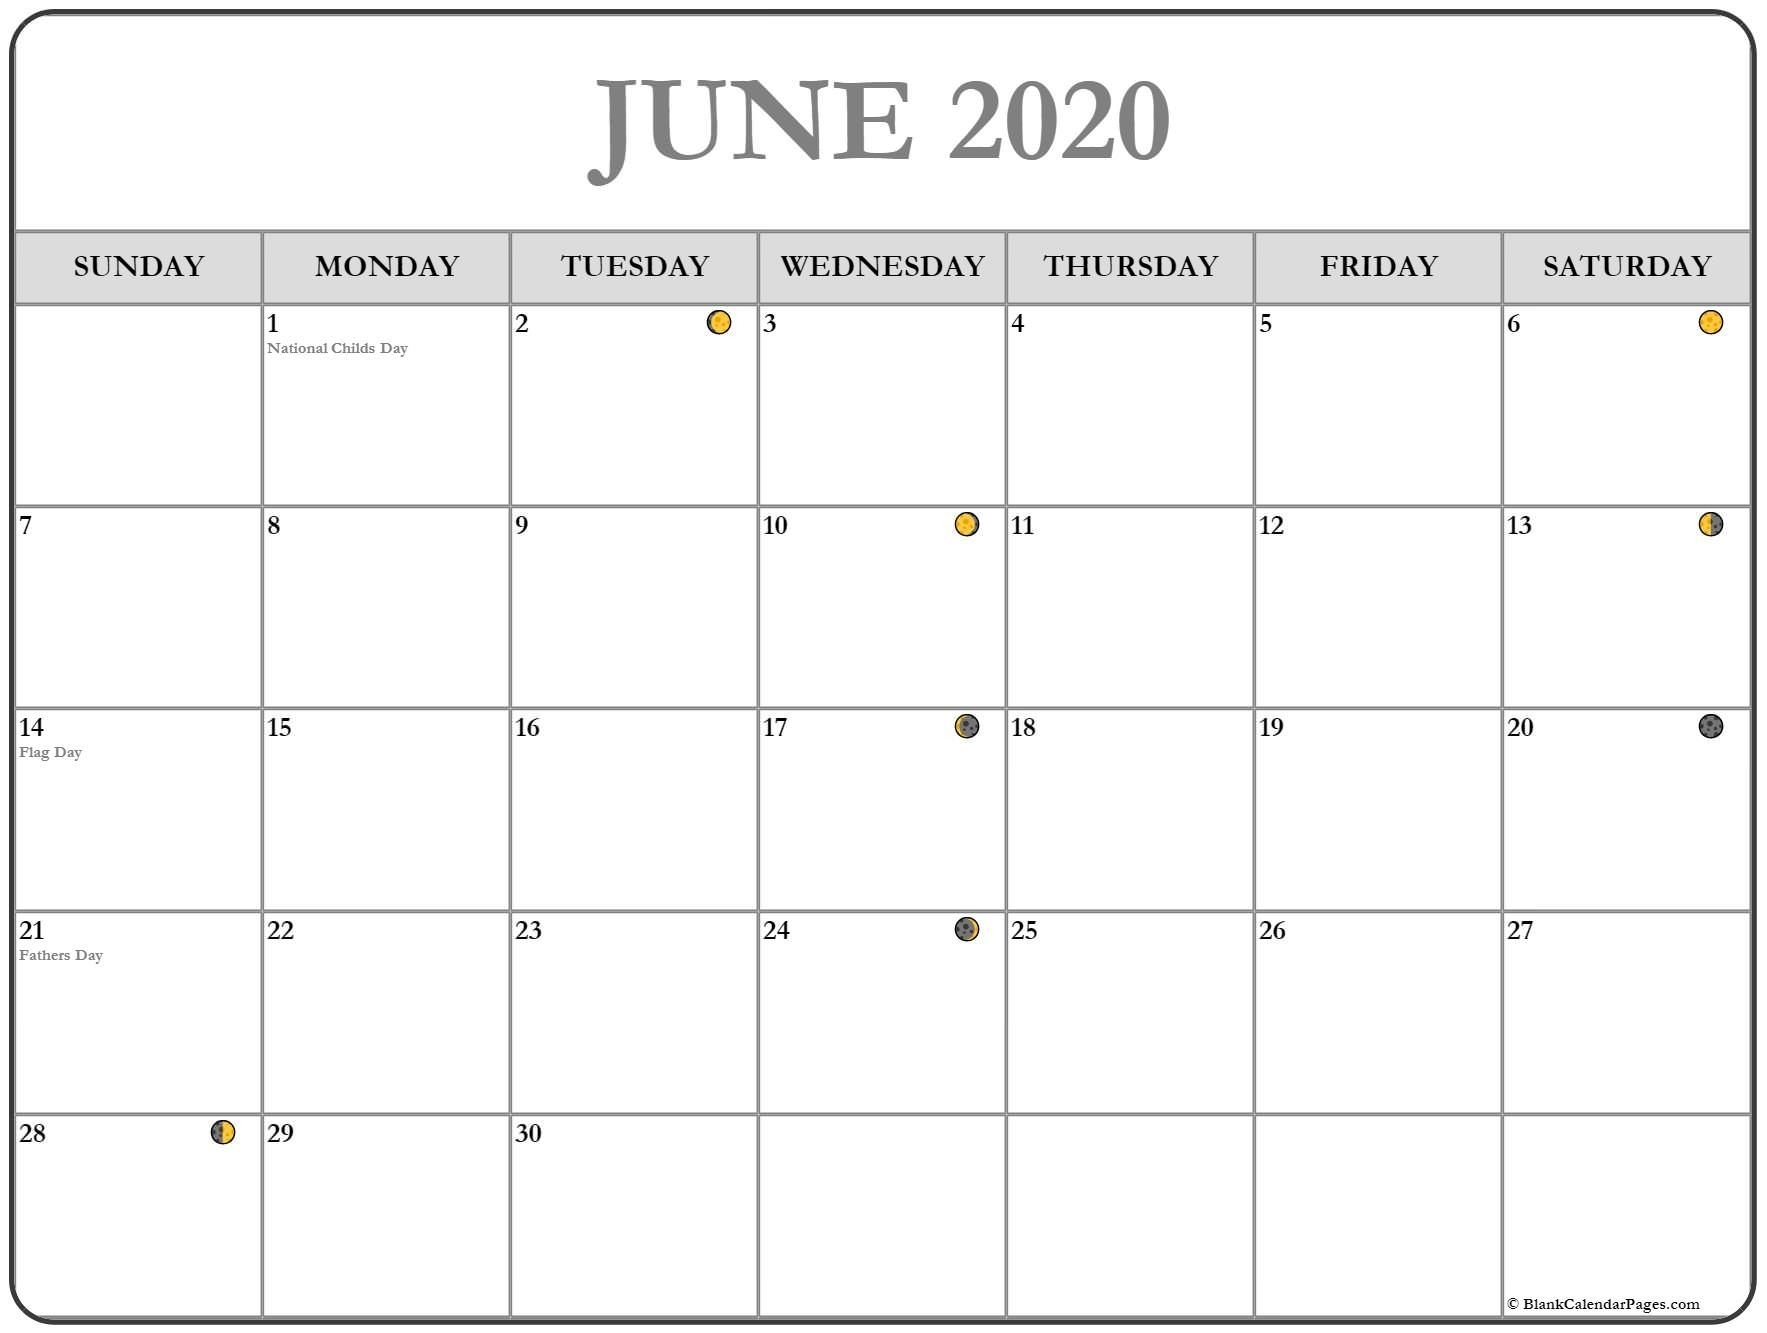 June 2020 Moon Phases Calendar | Moon Phase Calendar, Moon